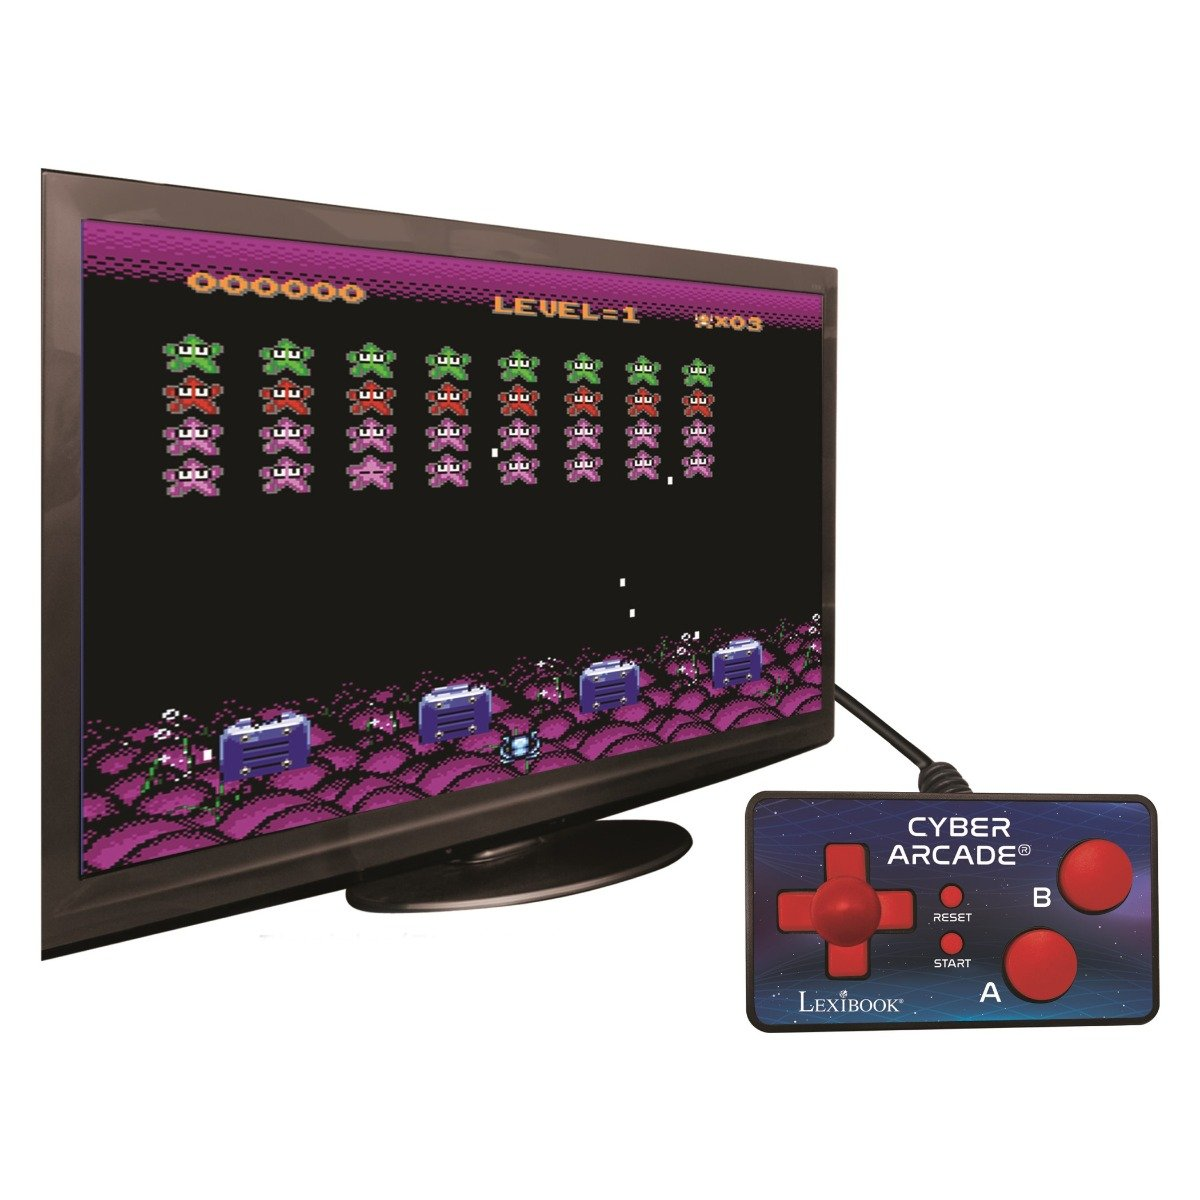 Consola TV Cyber Arcade N'Play Lexibook, 200 jocuri